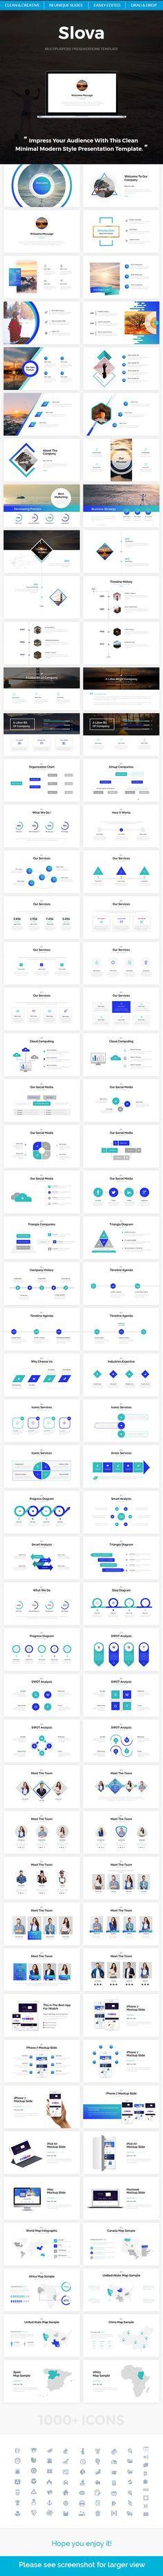 Slova - Business Powerpoint Template - PowerPoint Templates Presentation Templates